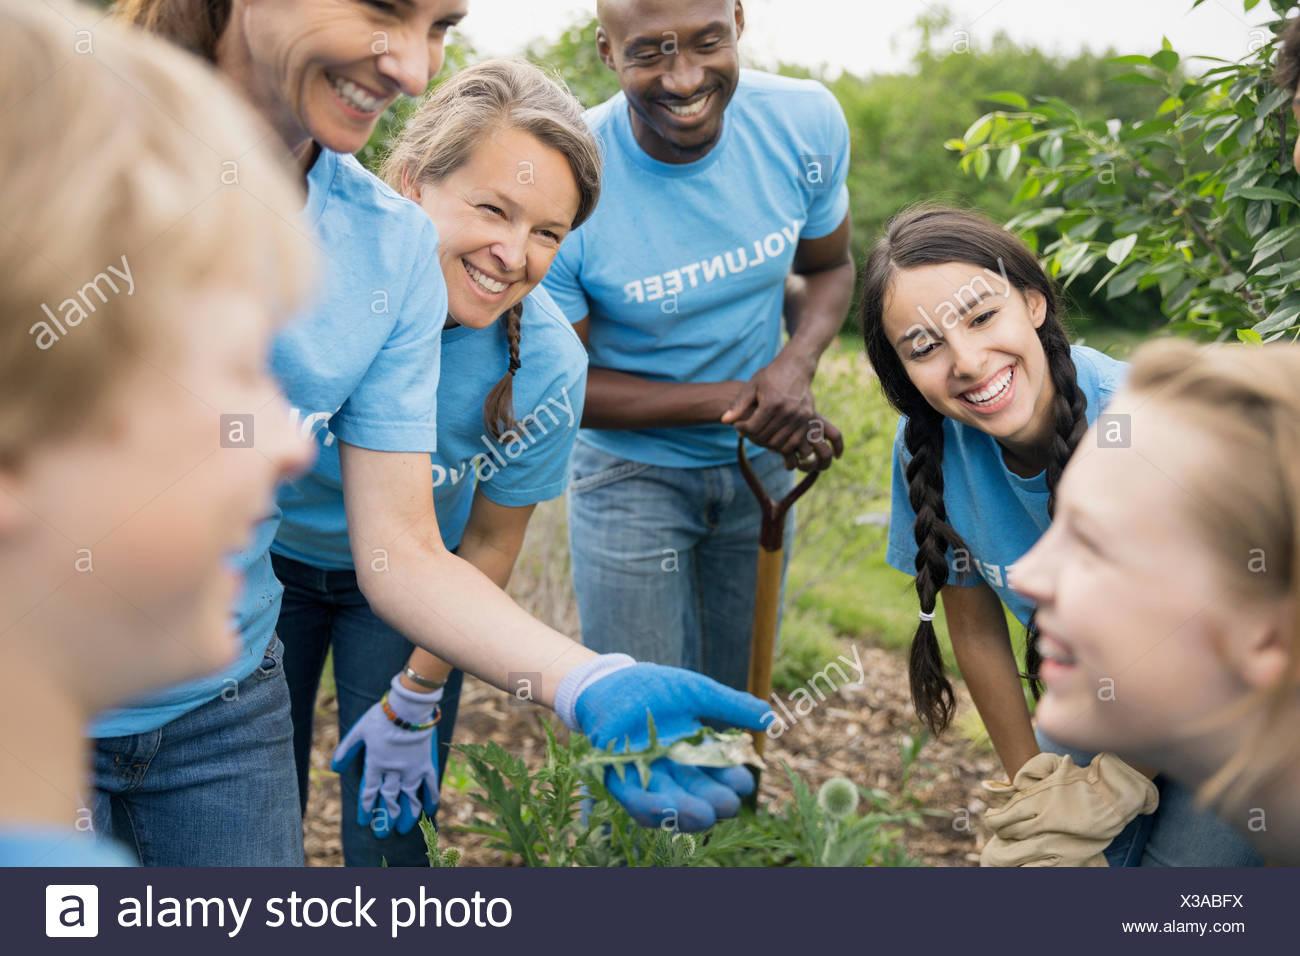 Freiwillige in Garten im Gespräch Stockbild